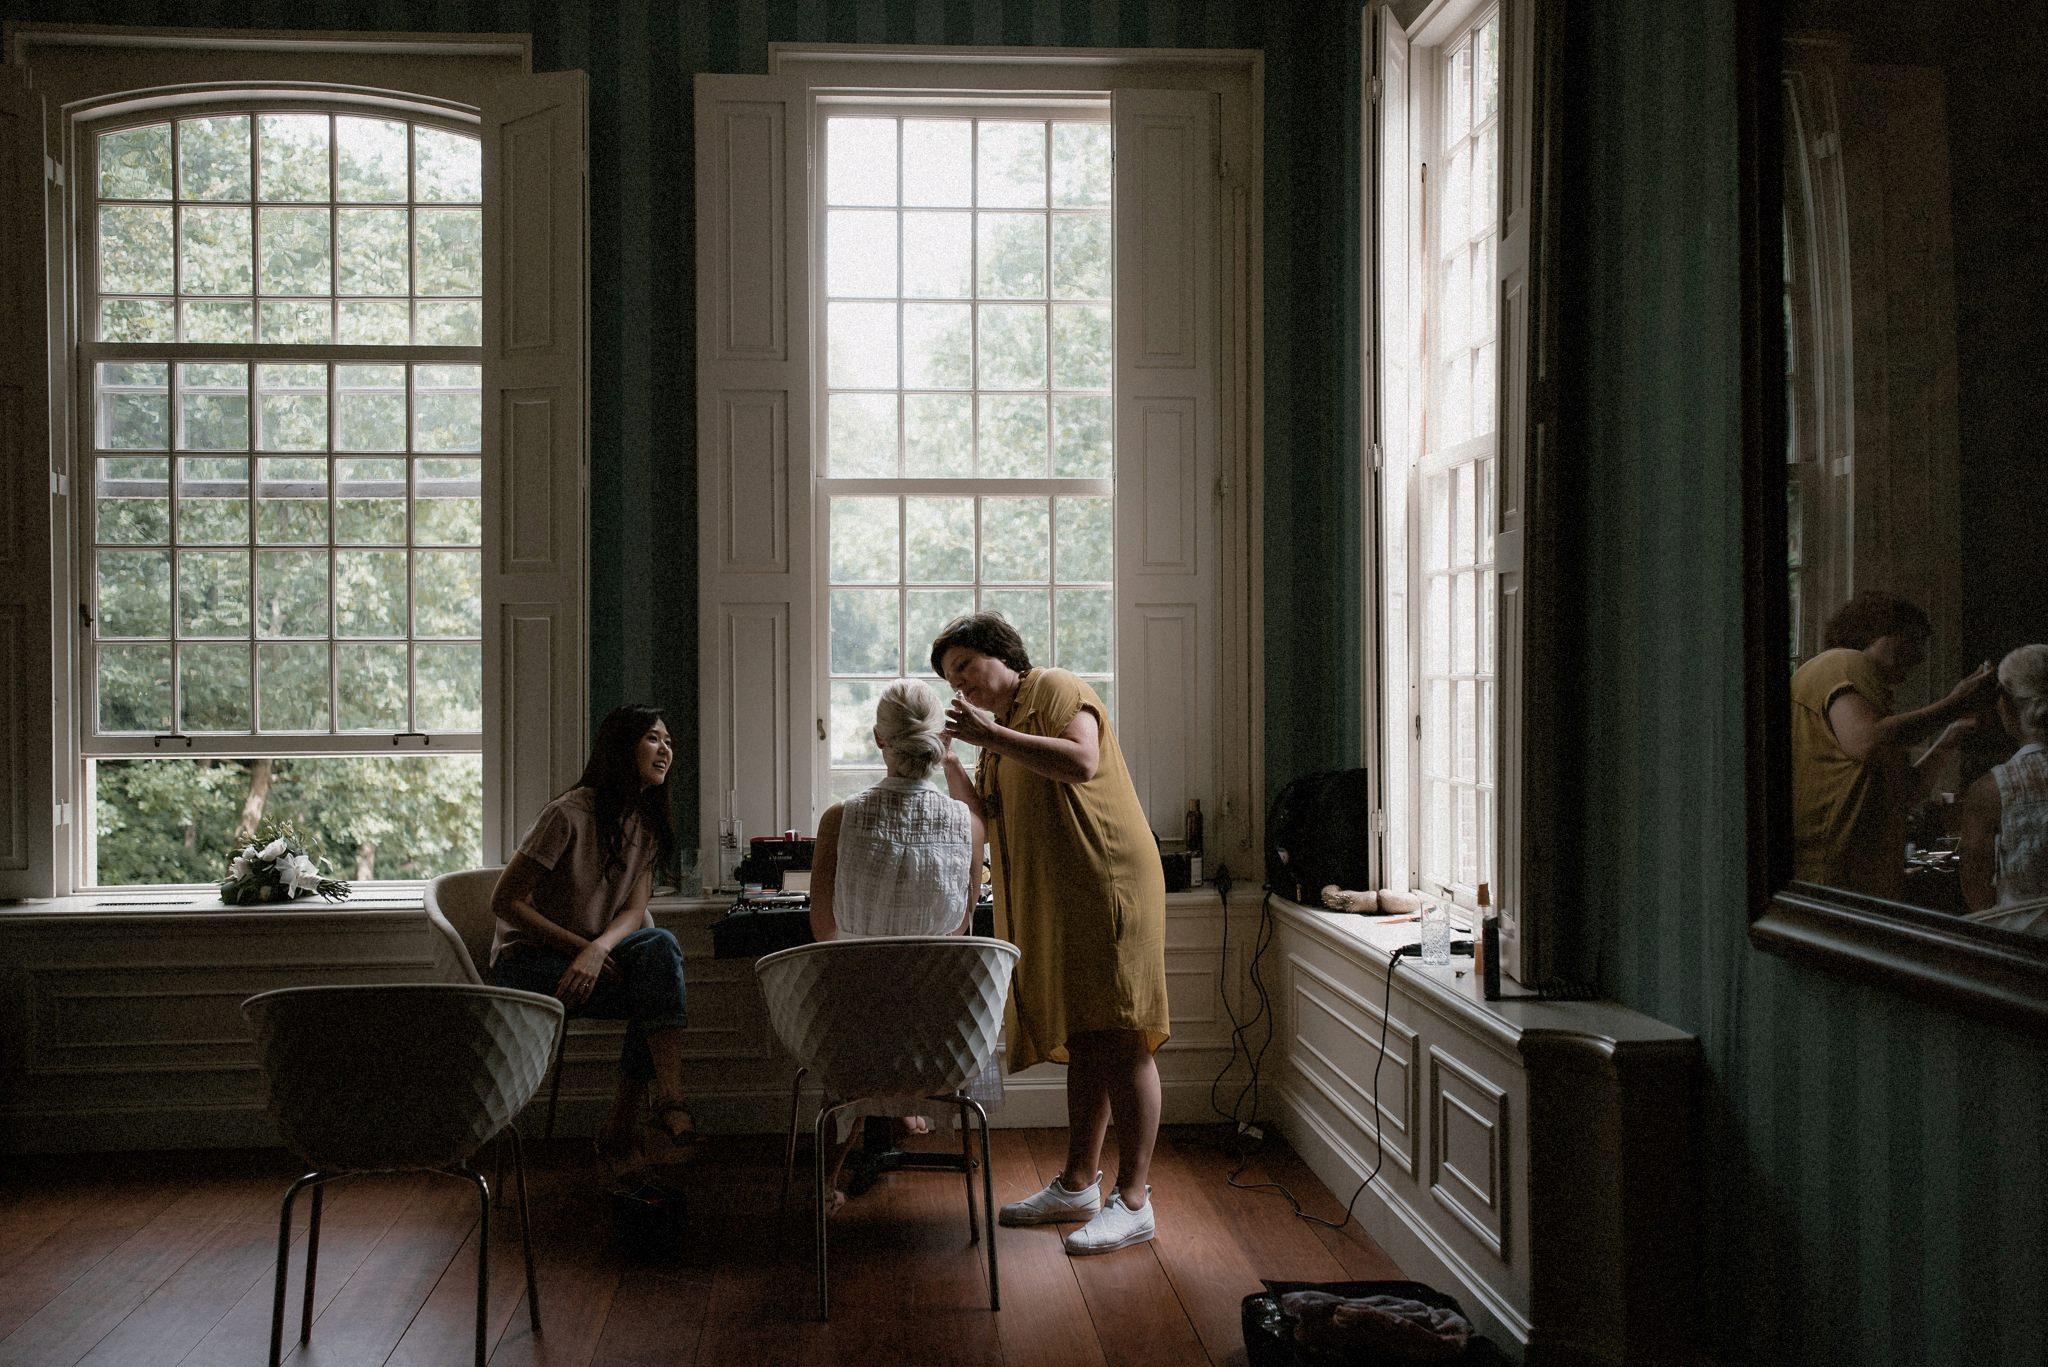 Bruidsfotografie Buitenplaats Sparrendaal - Naomi van der Kraan 0006.jpg